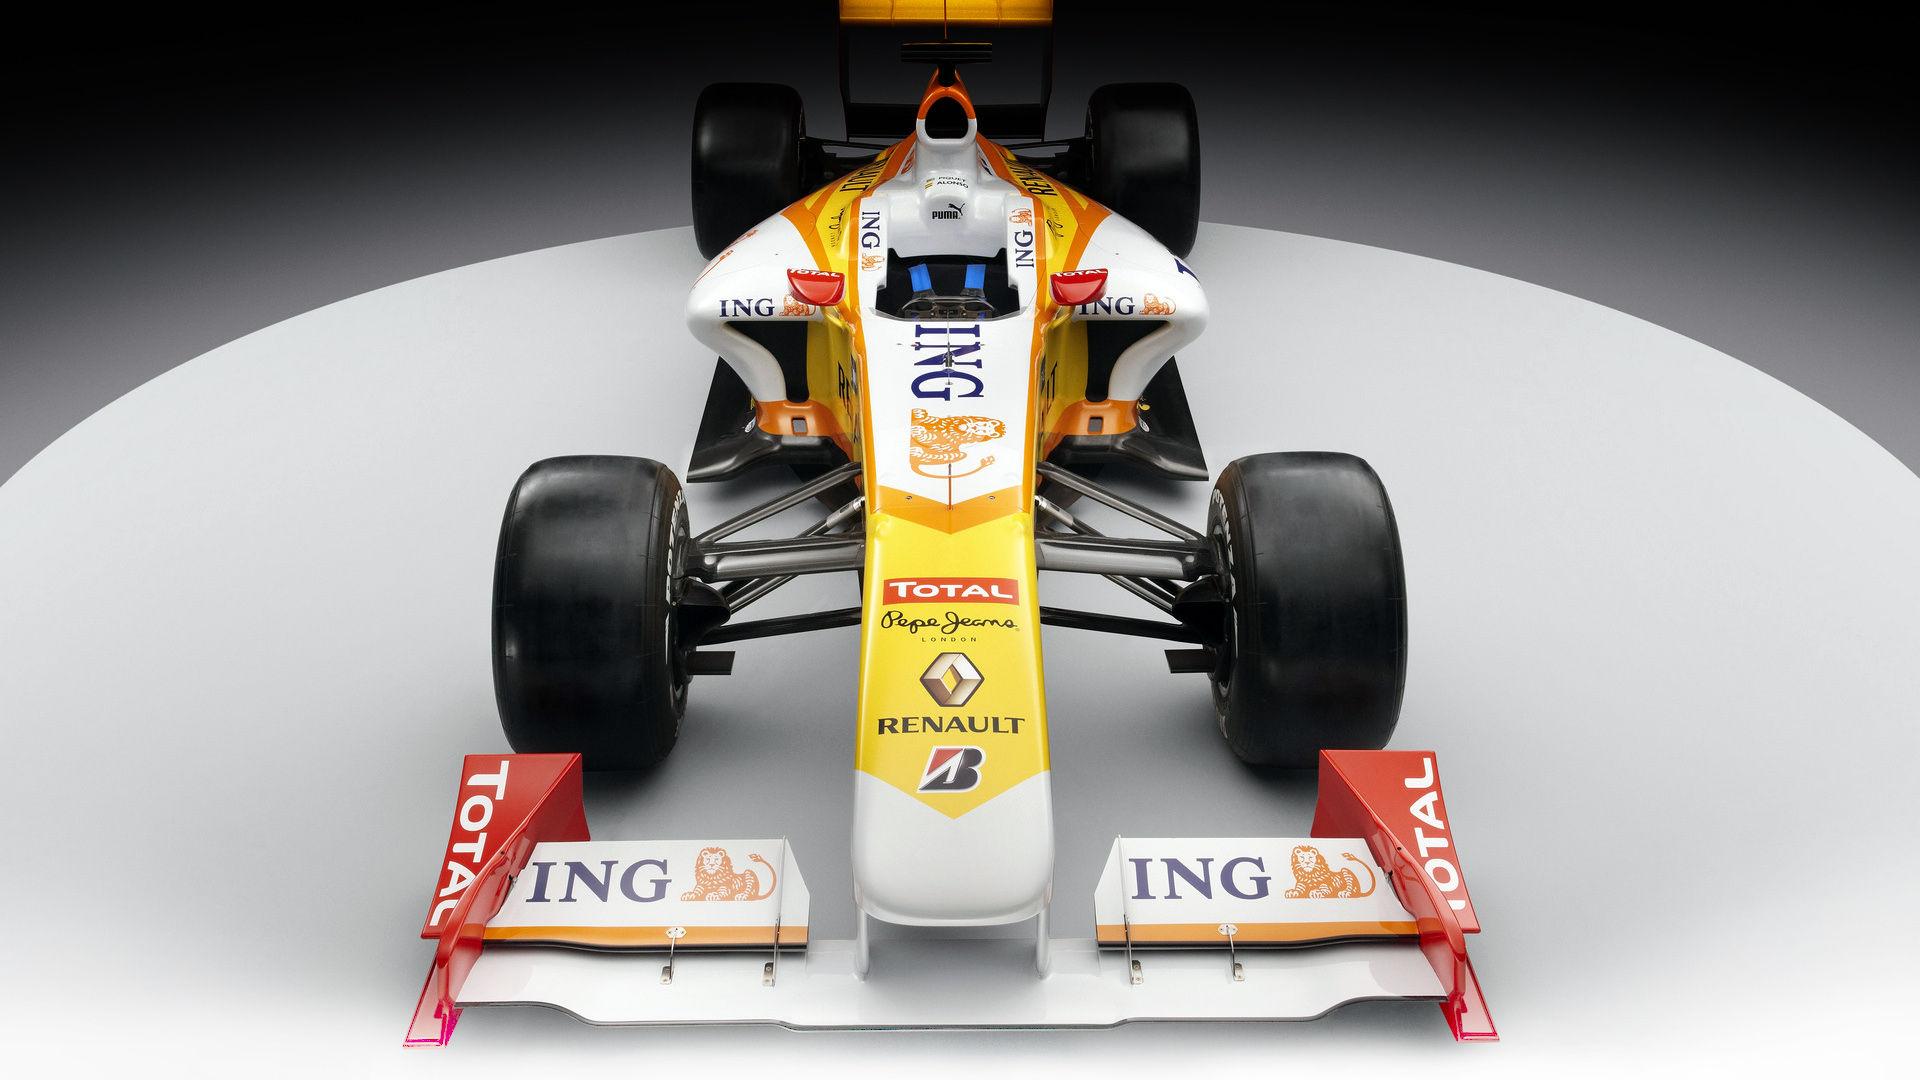 2009 Renault F1 R29